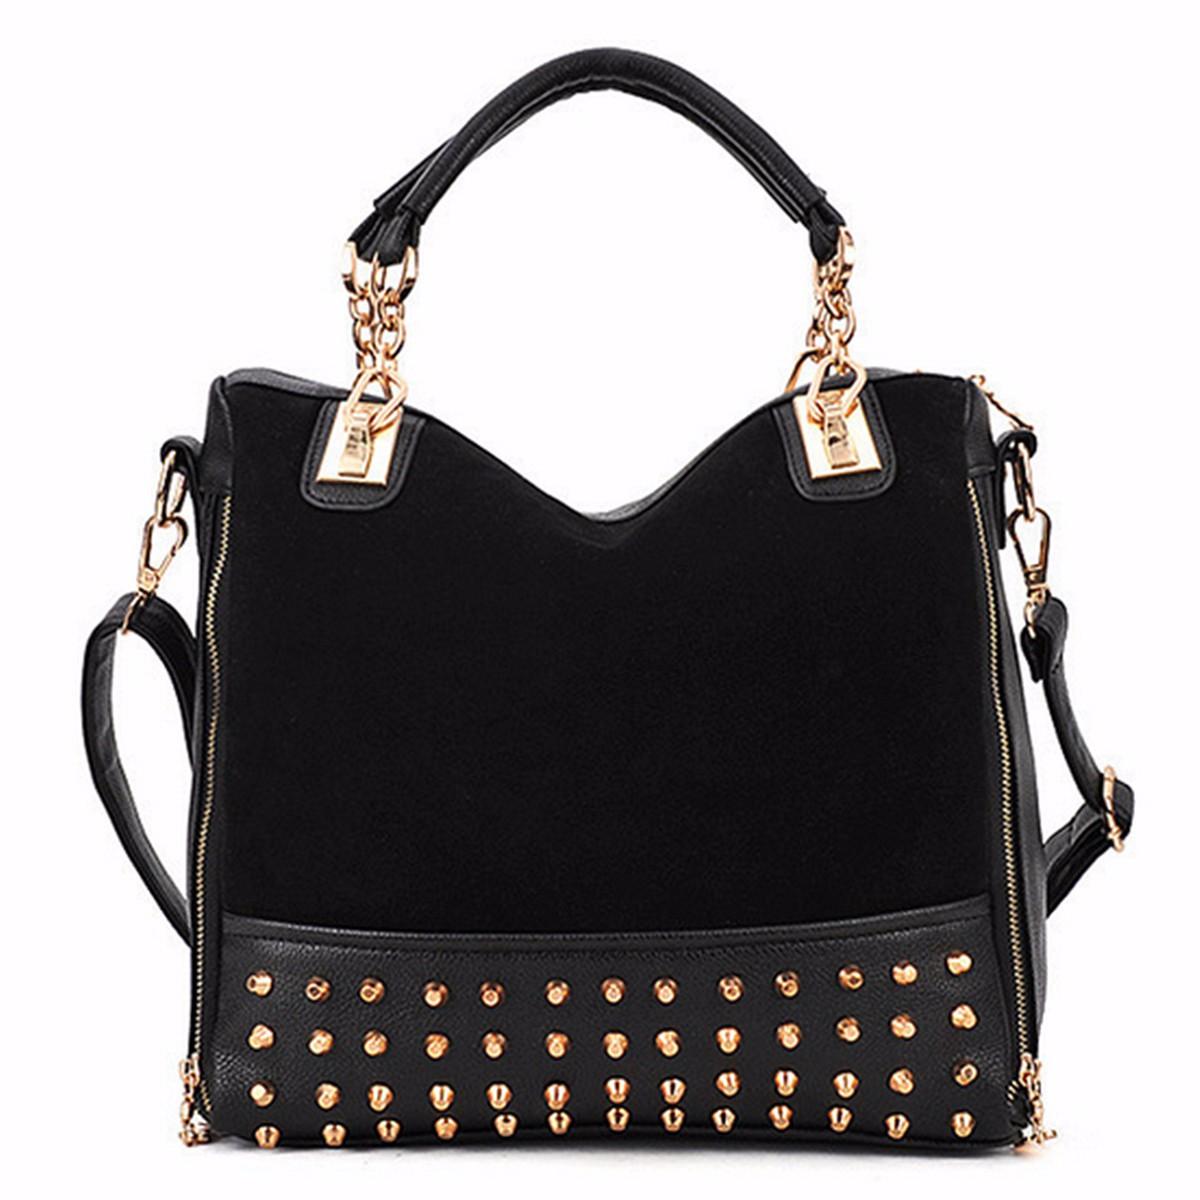 Women Ladies Exquisite Luruxy Rivet Studded Tote Shoulder Messenger Handbag Bag